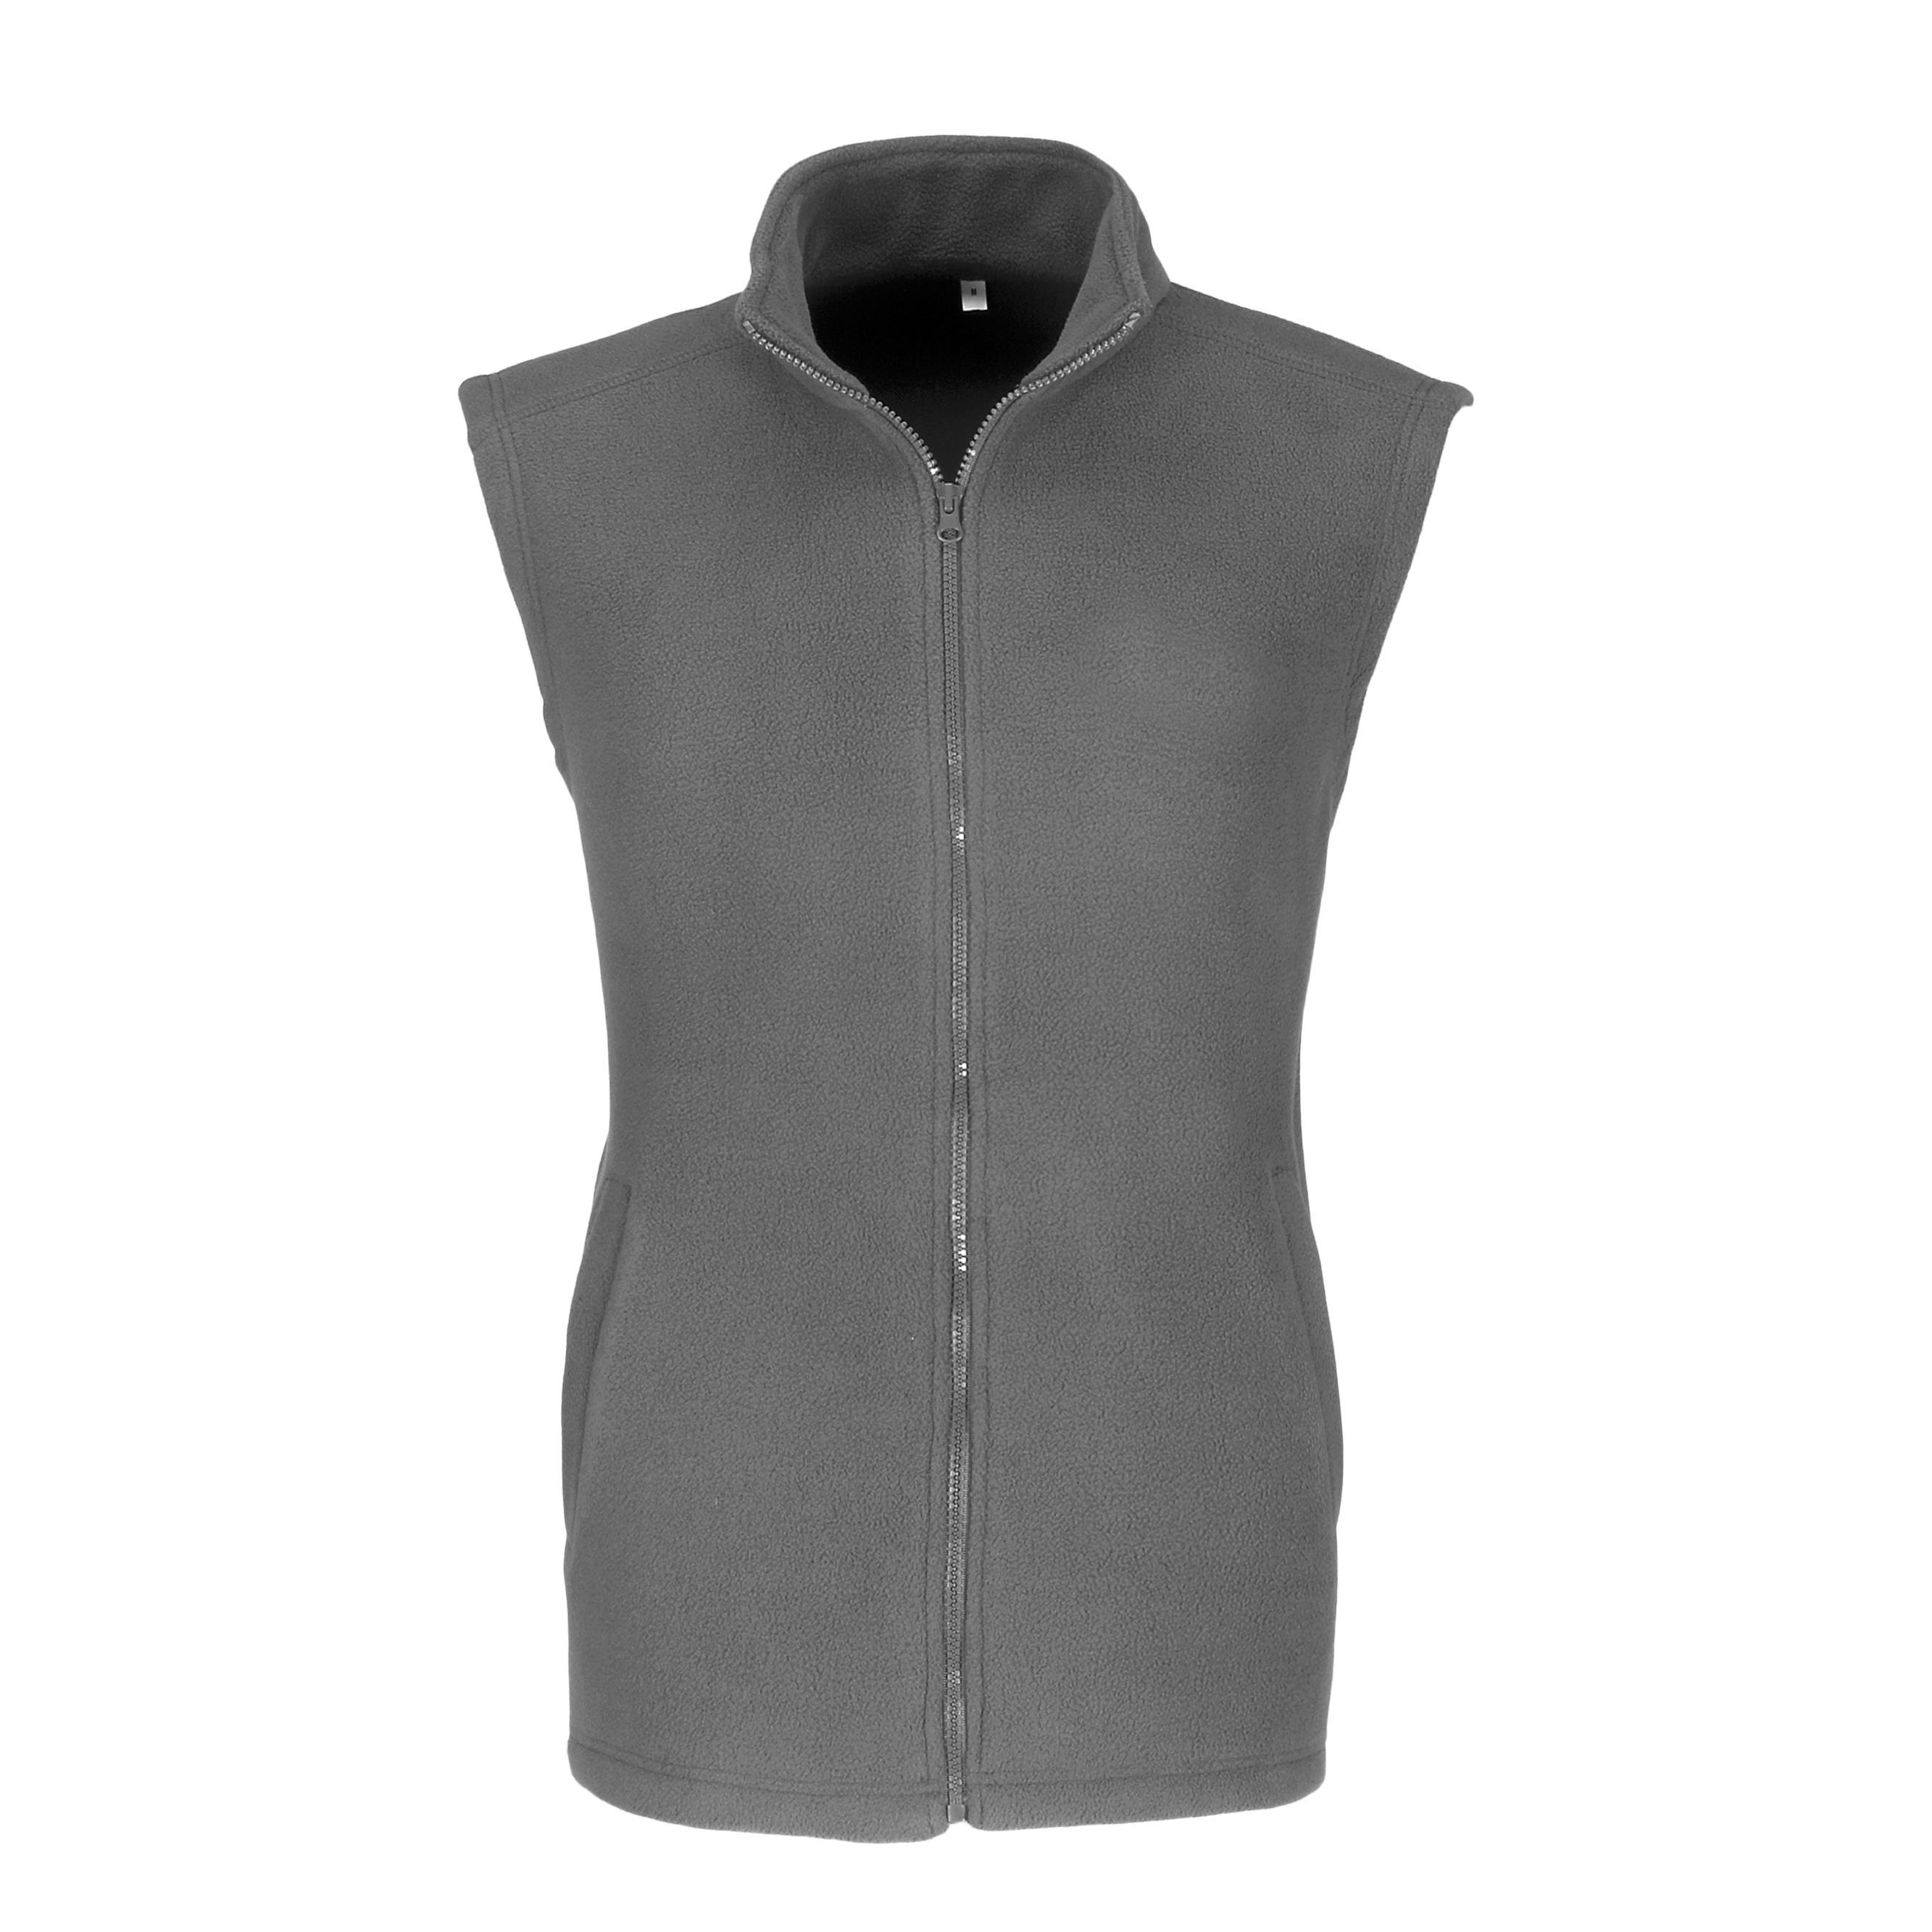 Mens Yukon Micro Fleece Bodywarmer - Grey Only